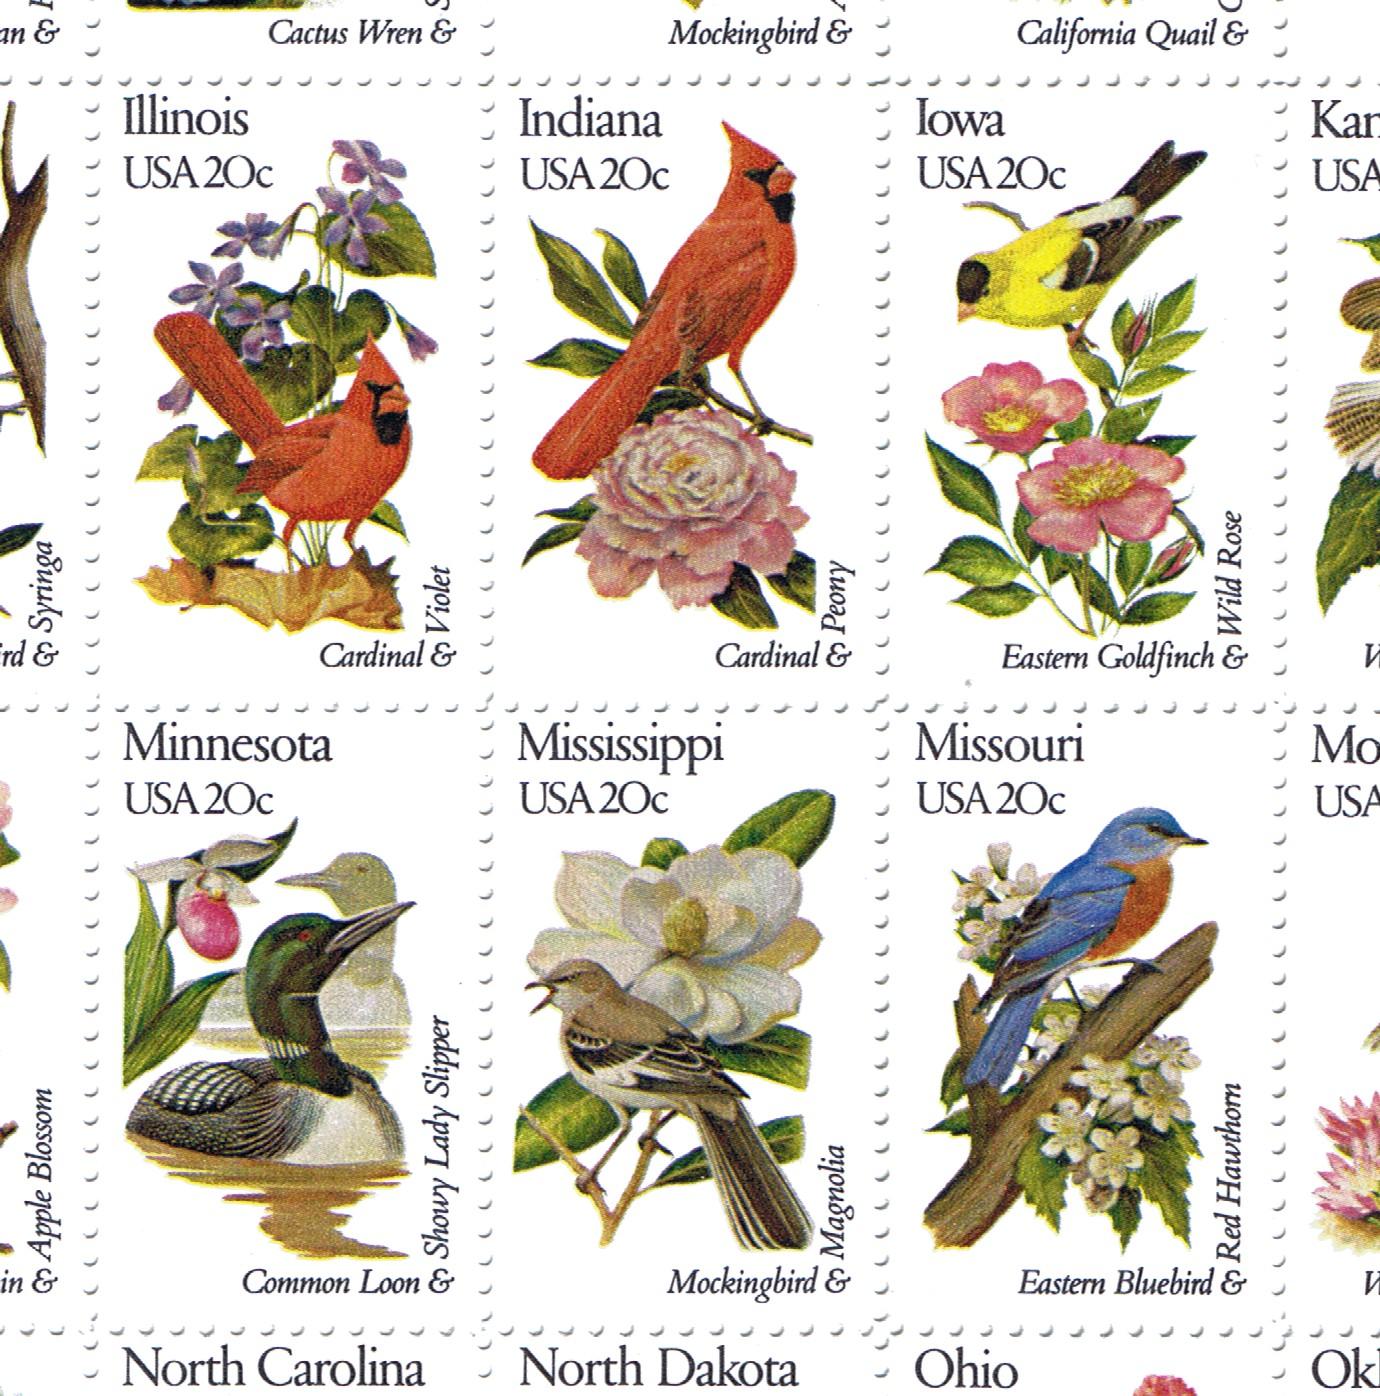 50 US State Birds Amp Flowers Postage Stamp Sheet Near Mint Scott 1953 02 Fre